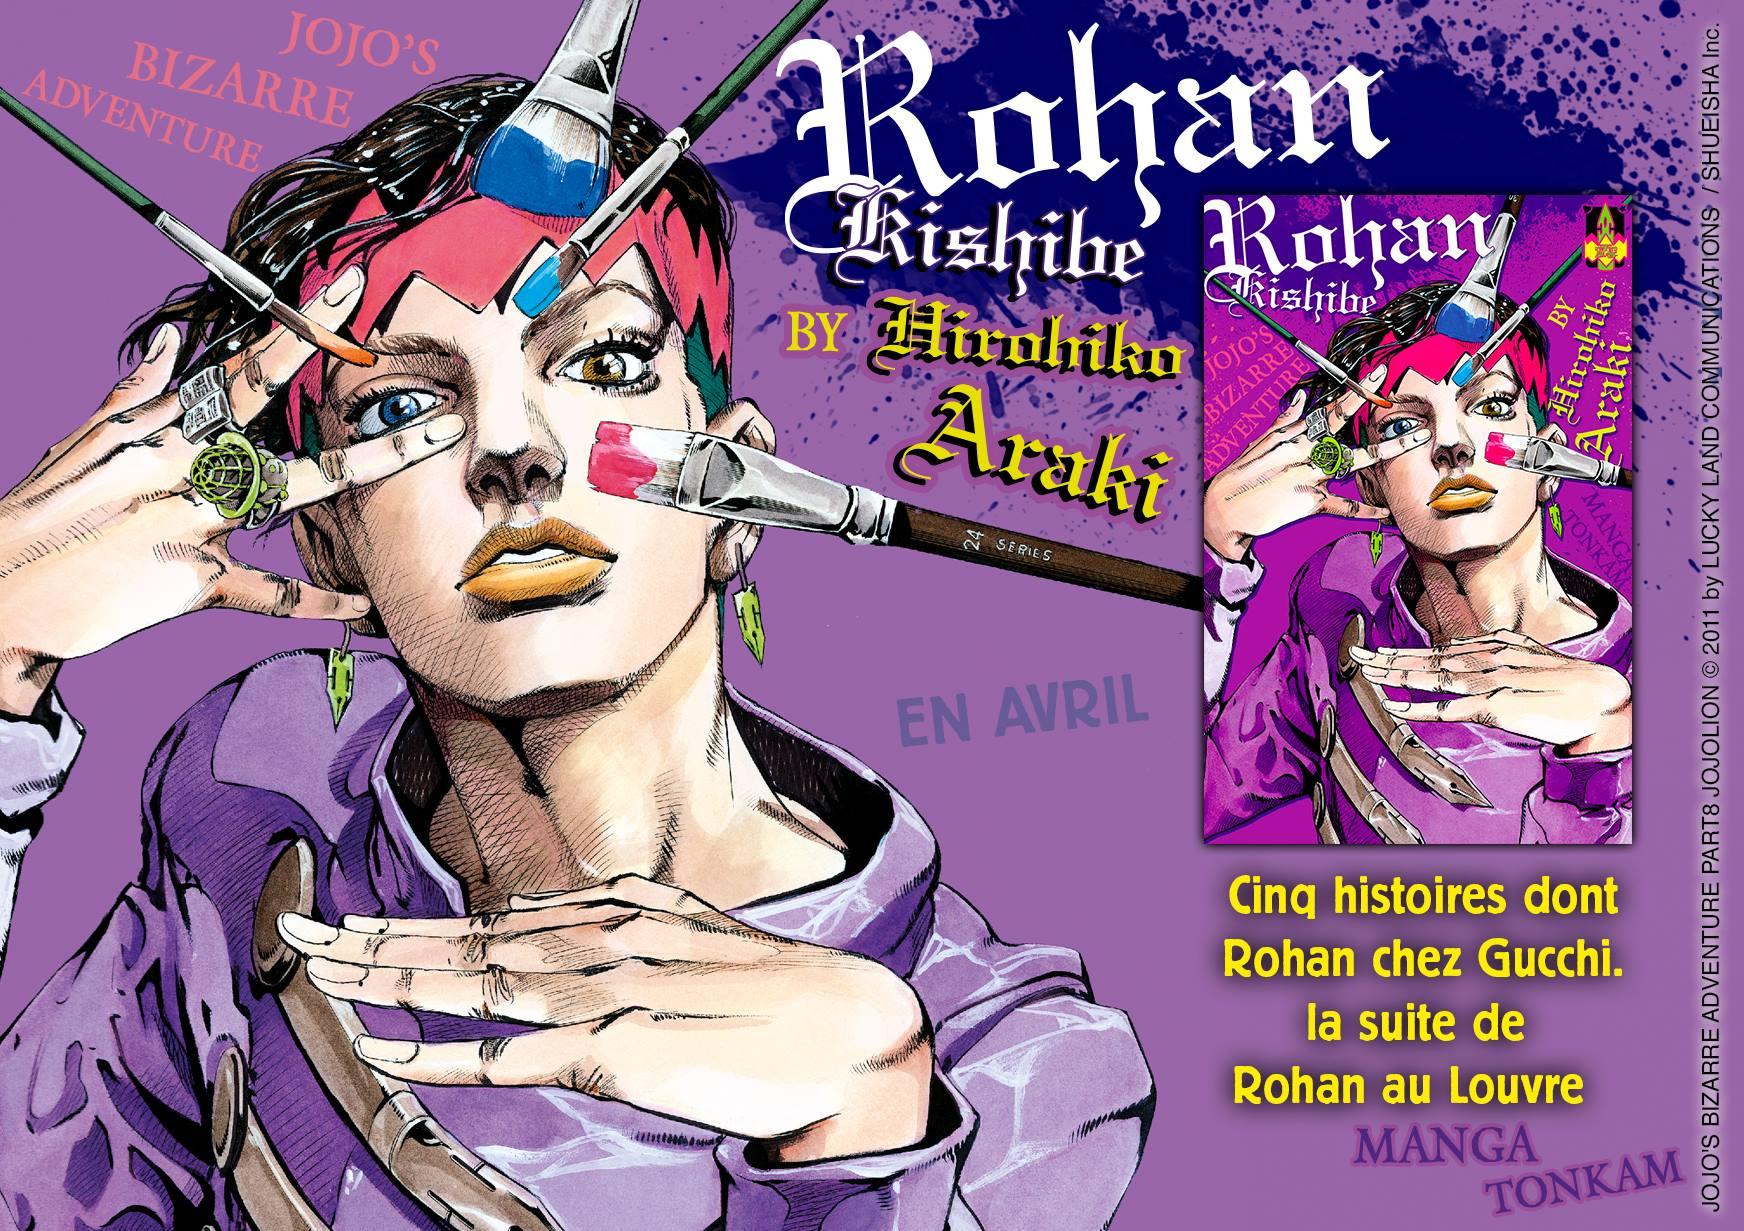 le manga rohan kishibe spin off de jojo 39 s bizarre adventure bientot chez tonkam 12 d cembre. Black Bedroom Furniture Sets. Home Design Ideas